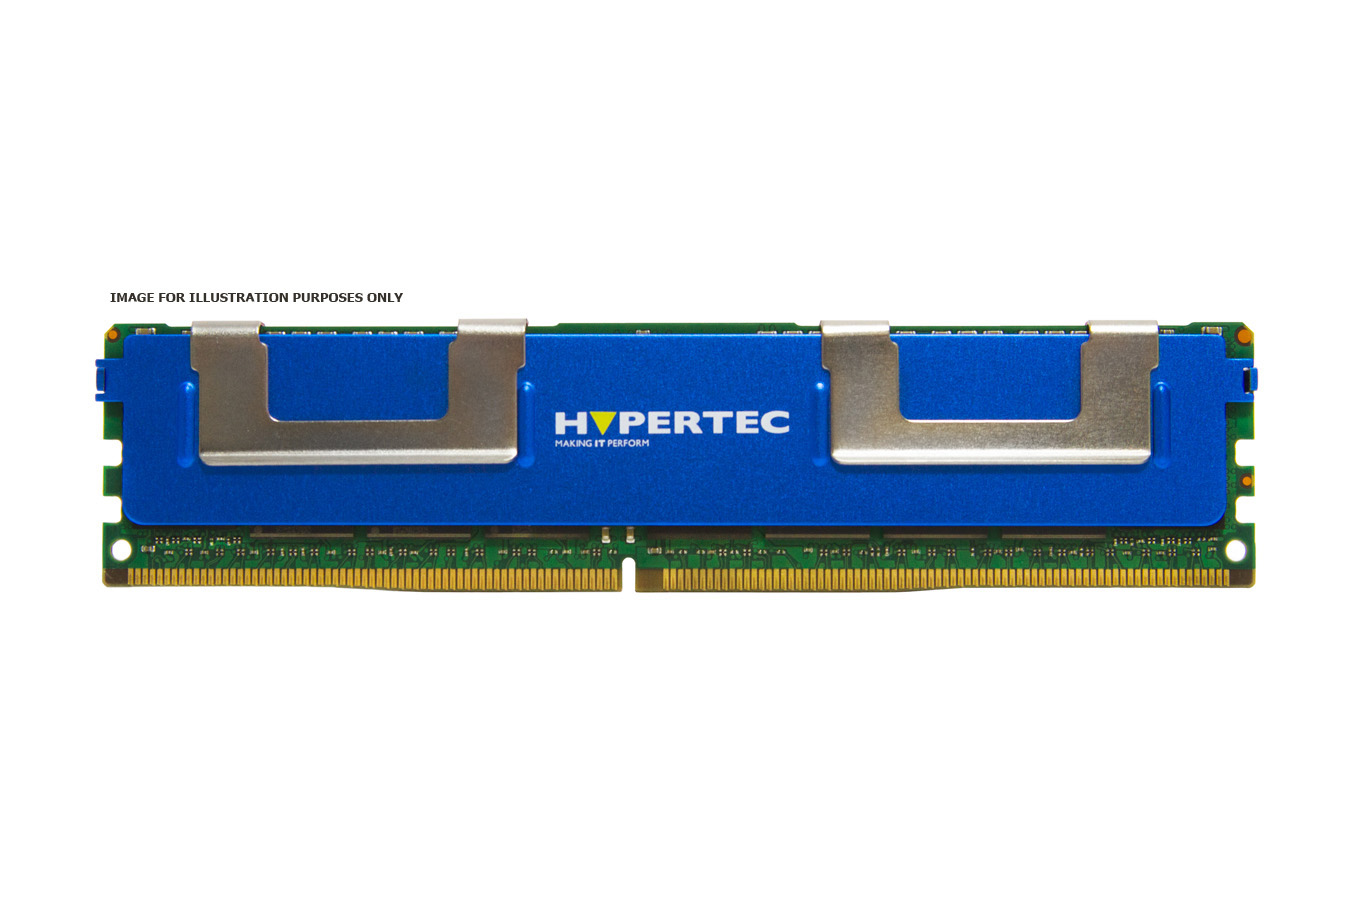 Hypertec 8GB Registered Low Voltage DIMM (PC3-12800R Dual Rank)